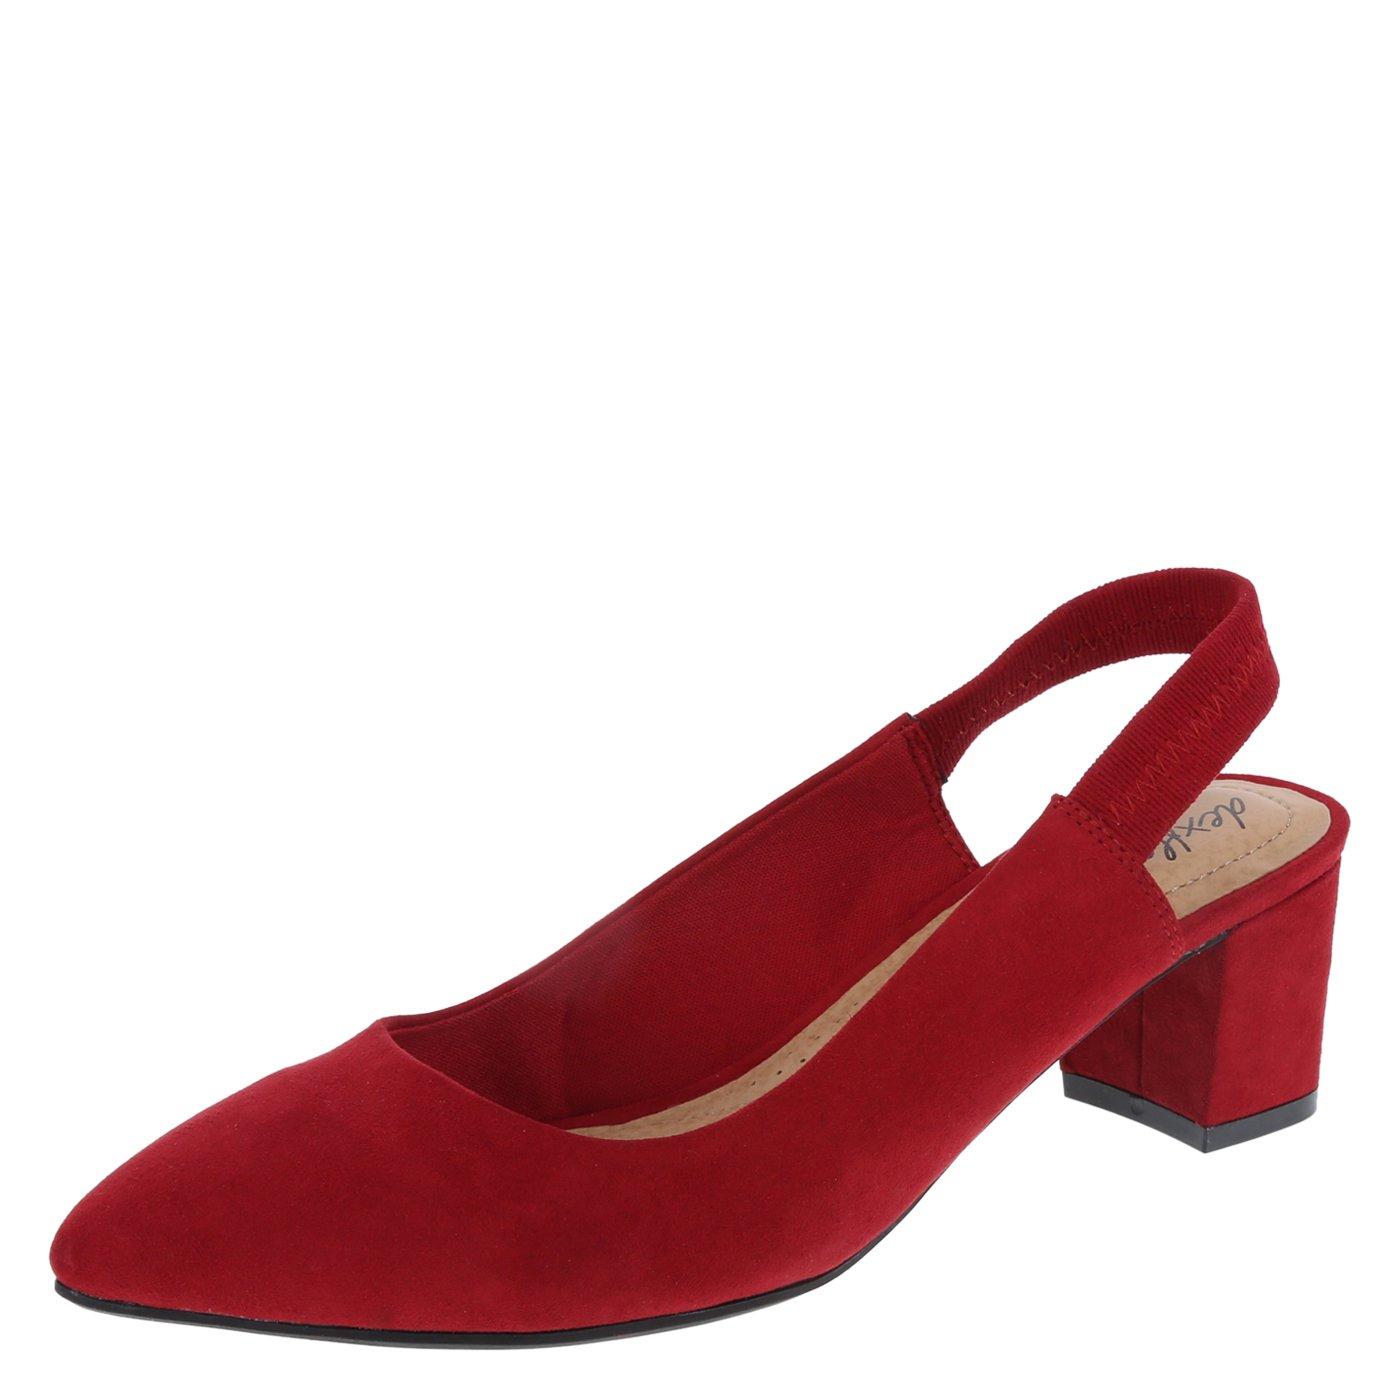 dexflex Comfort Red Suede Women's Stevie Sling 9.5 Wide